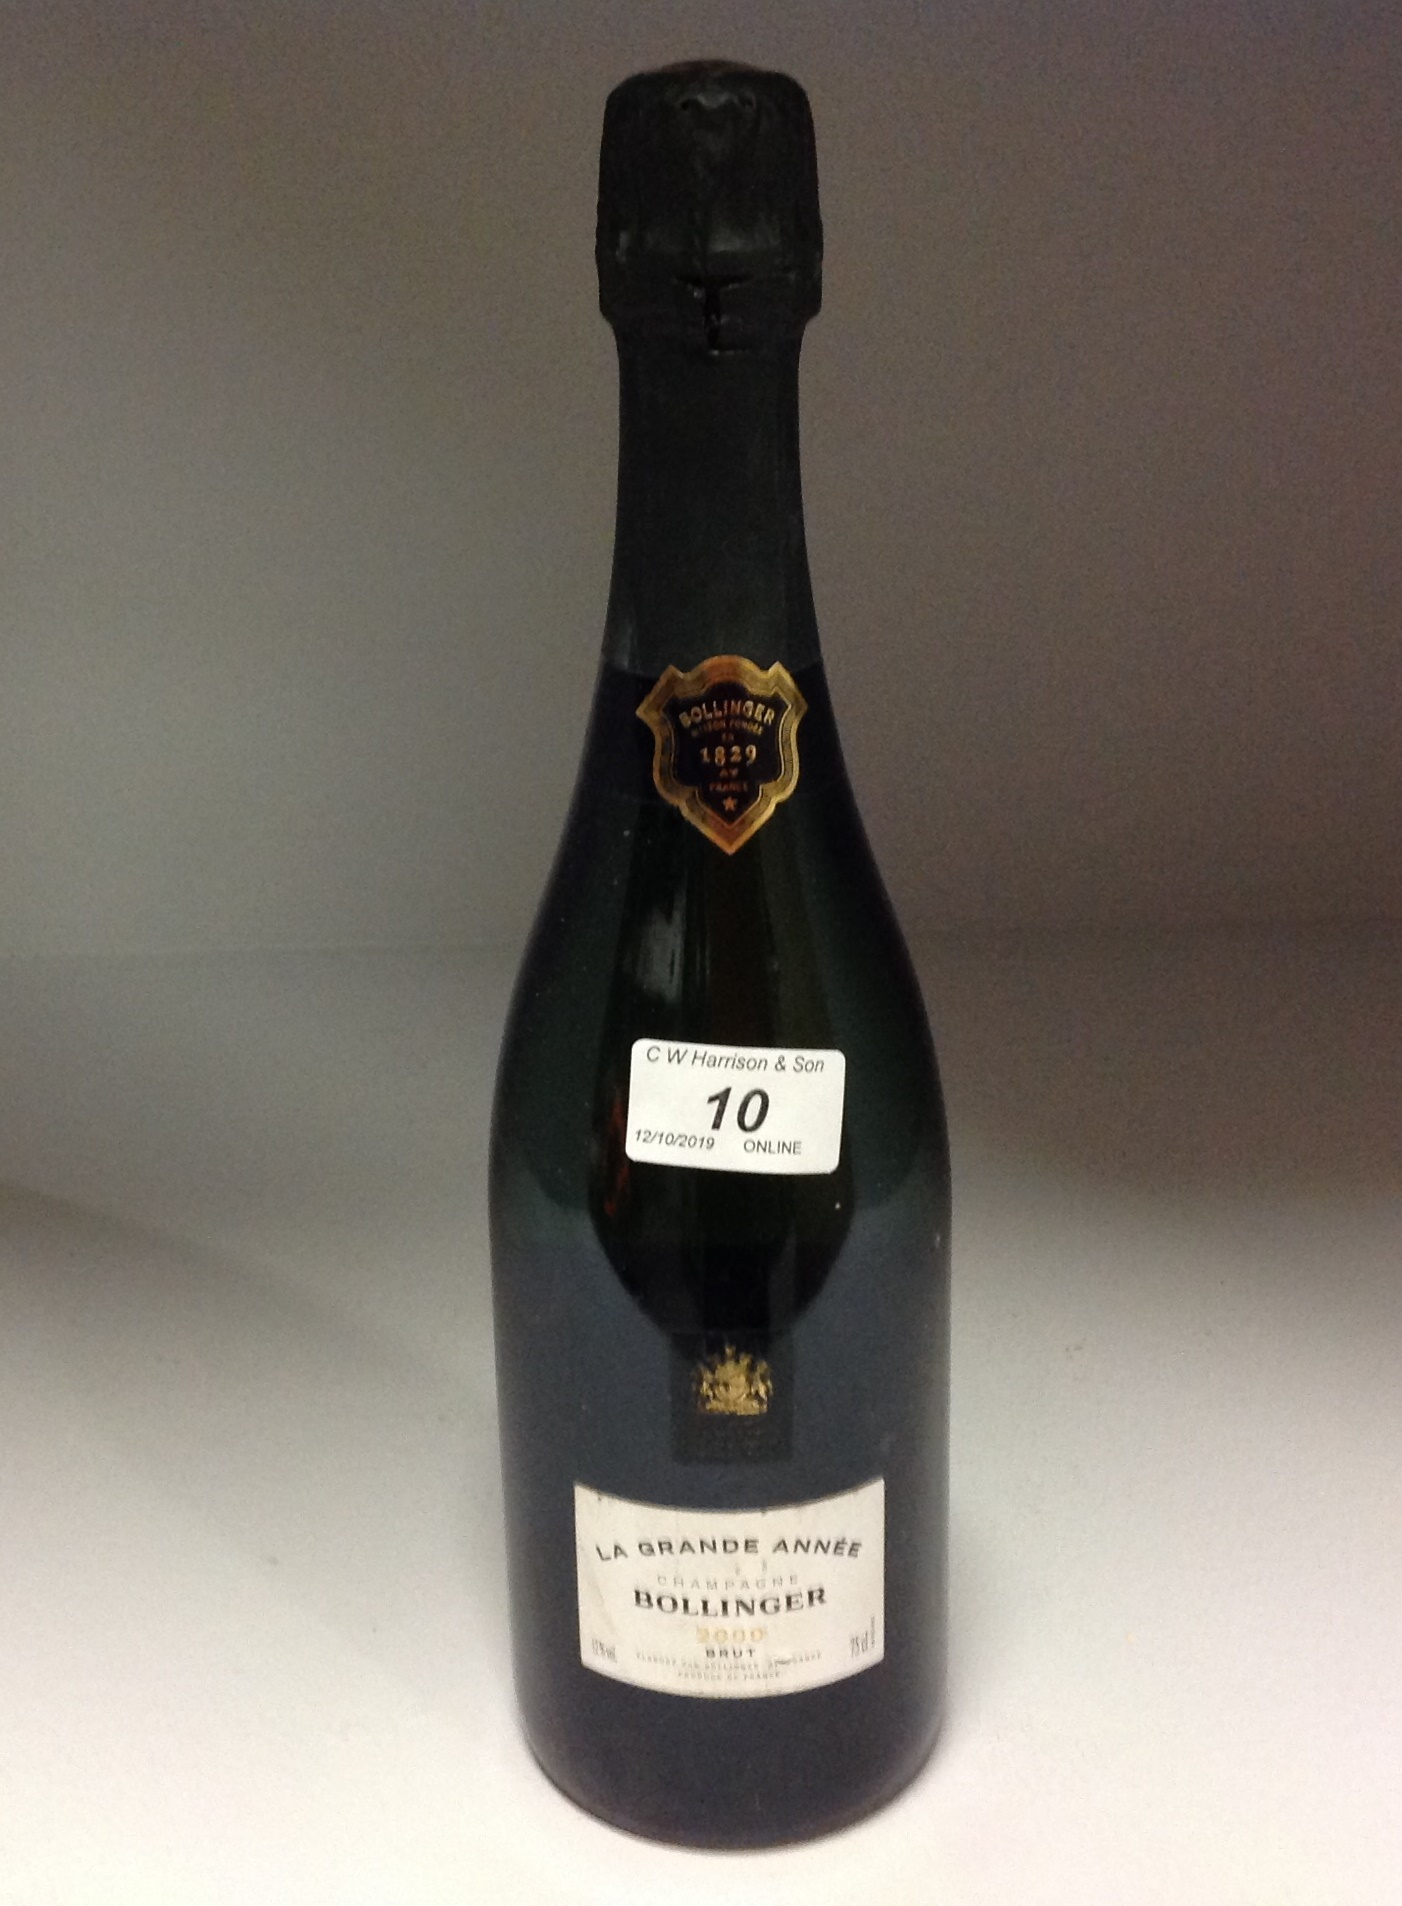 Lot 10 - 75cl bottle La Grande Annee Bollinger Br